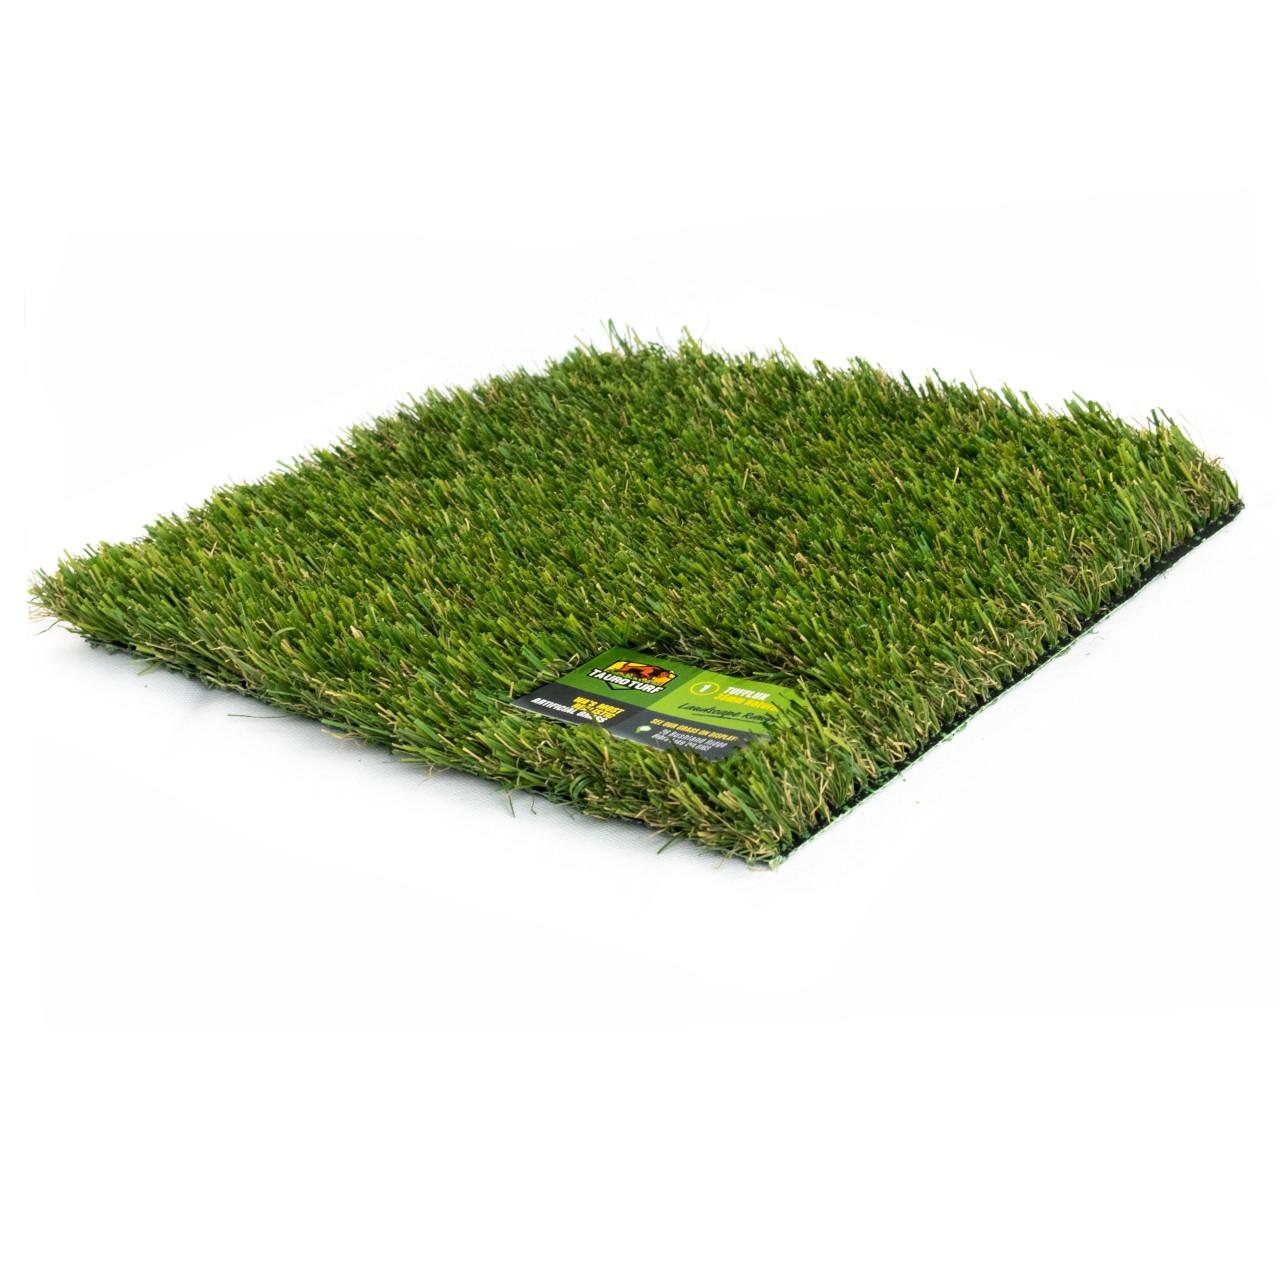 Tuff lux grass image